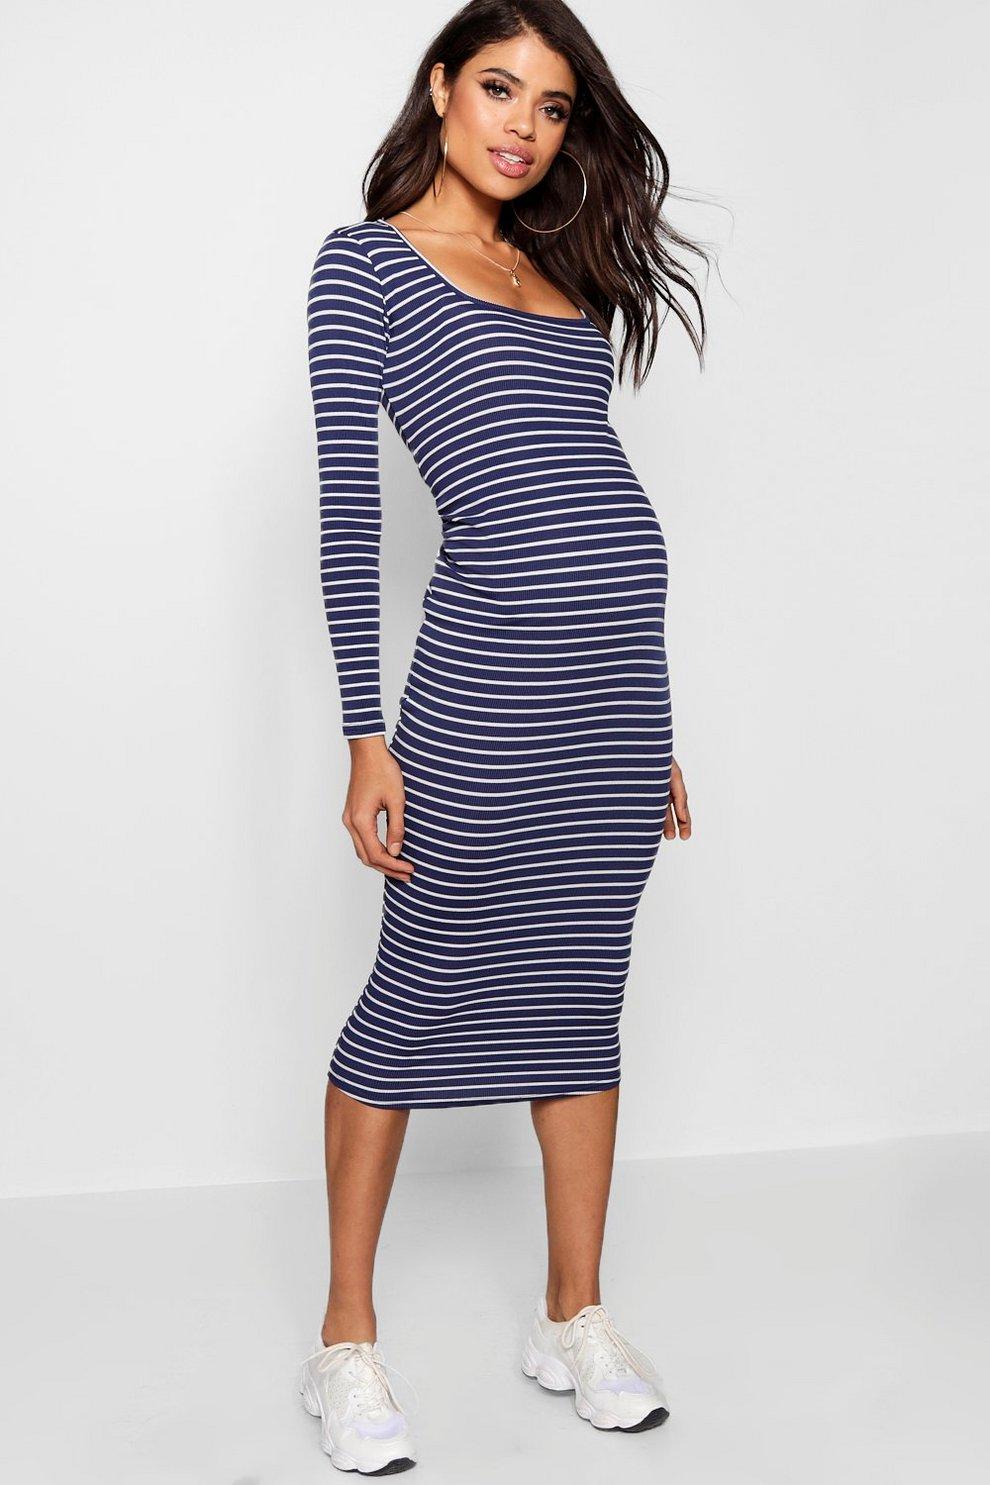 3defe46116cba Womens Navy Maternity Square Neck Rib Stripe Midi Dress